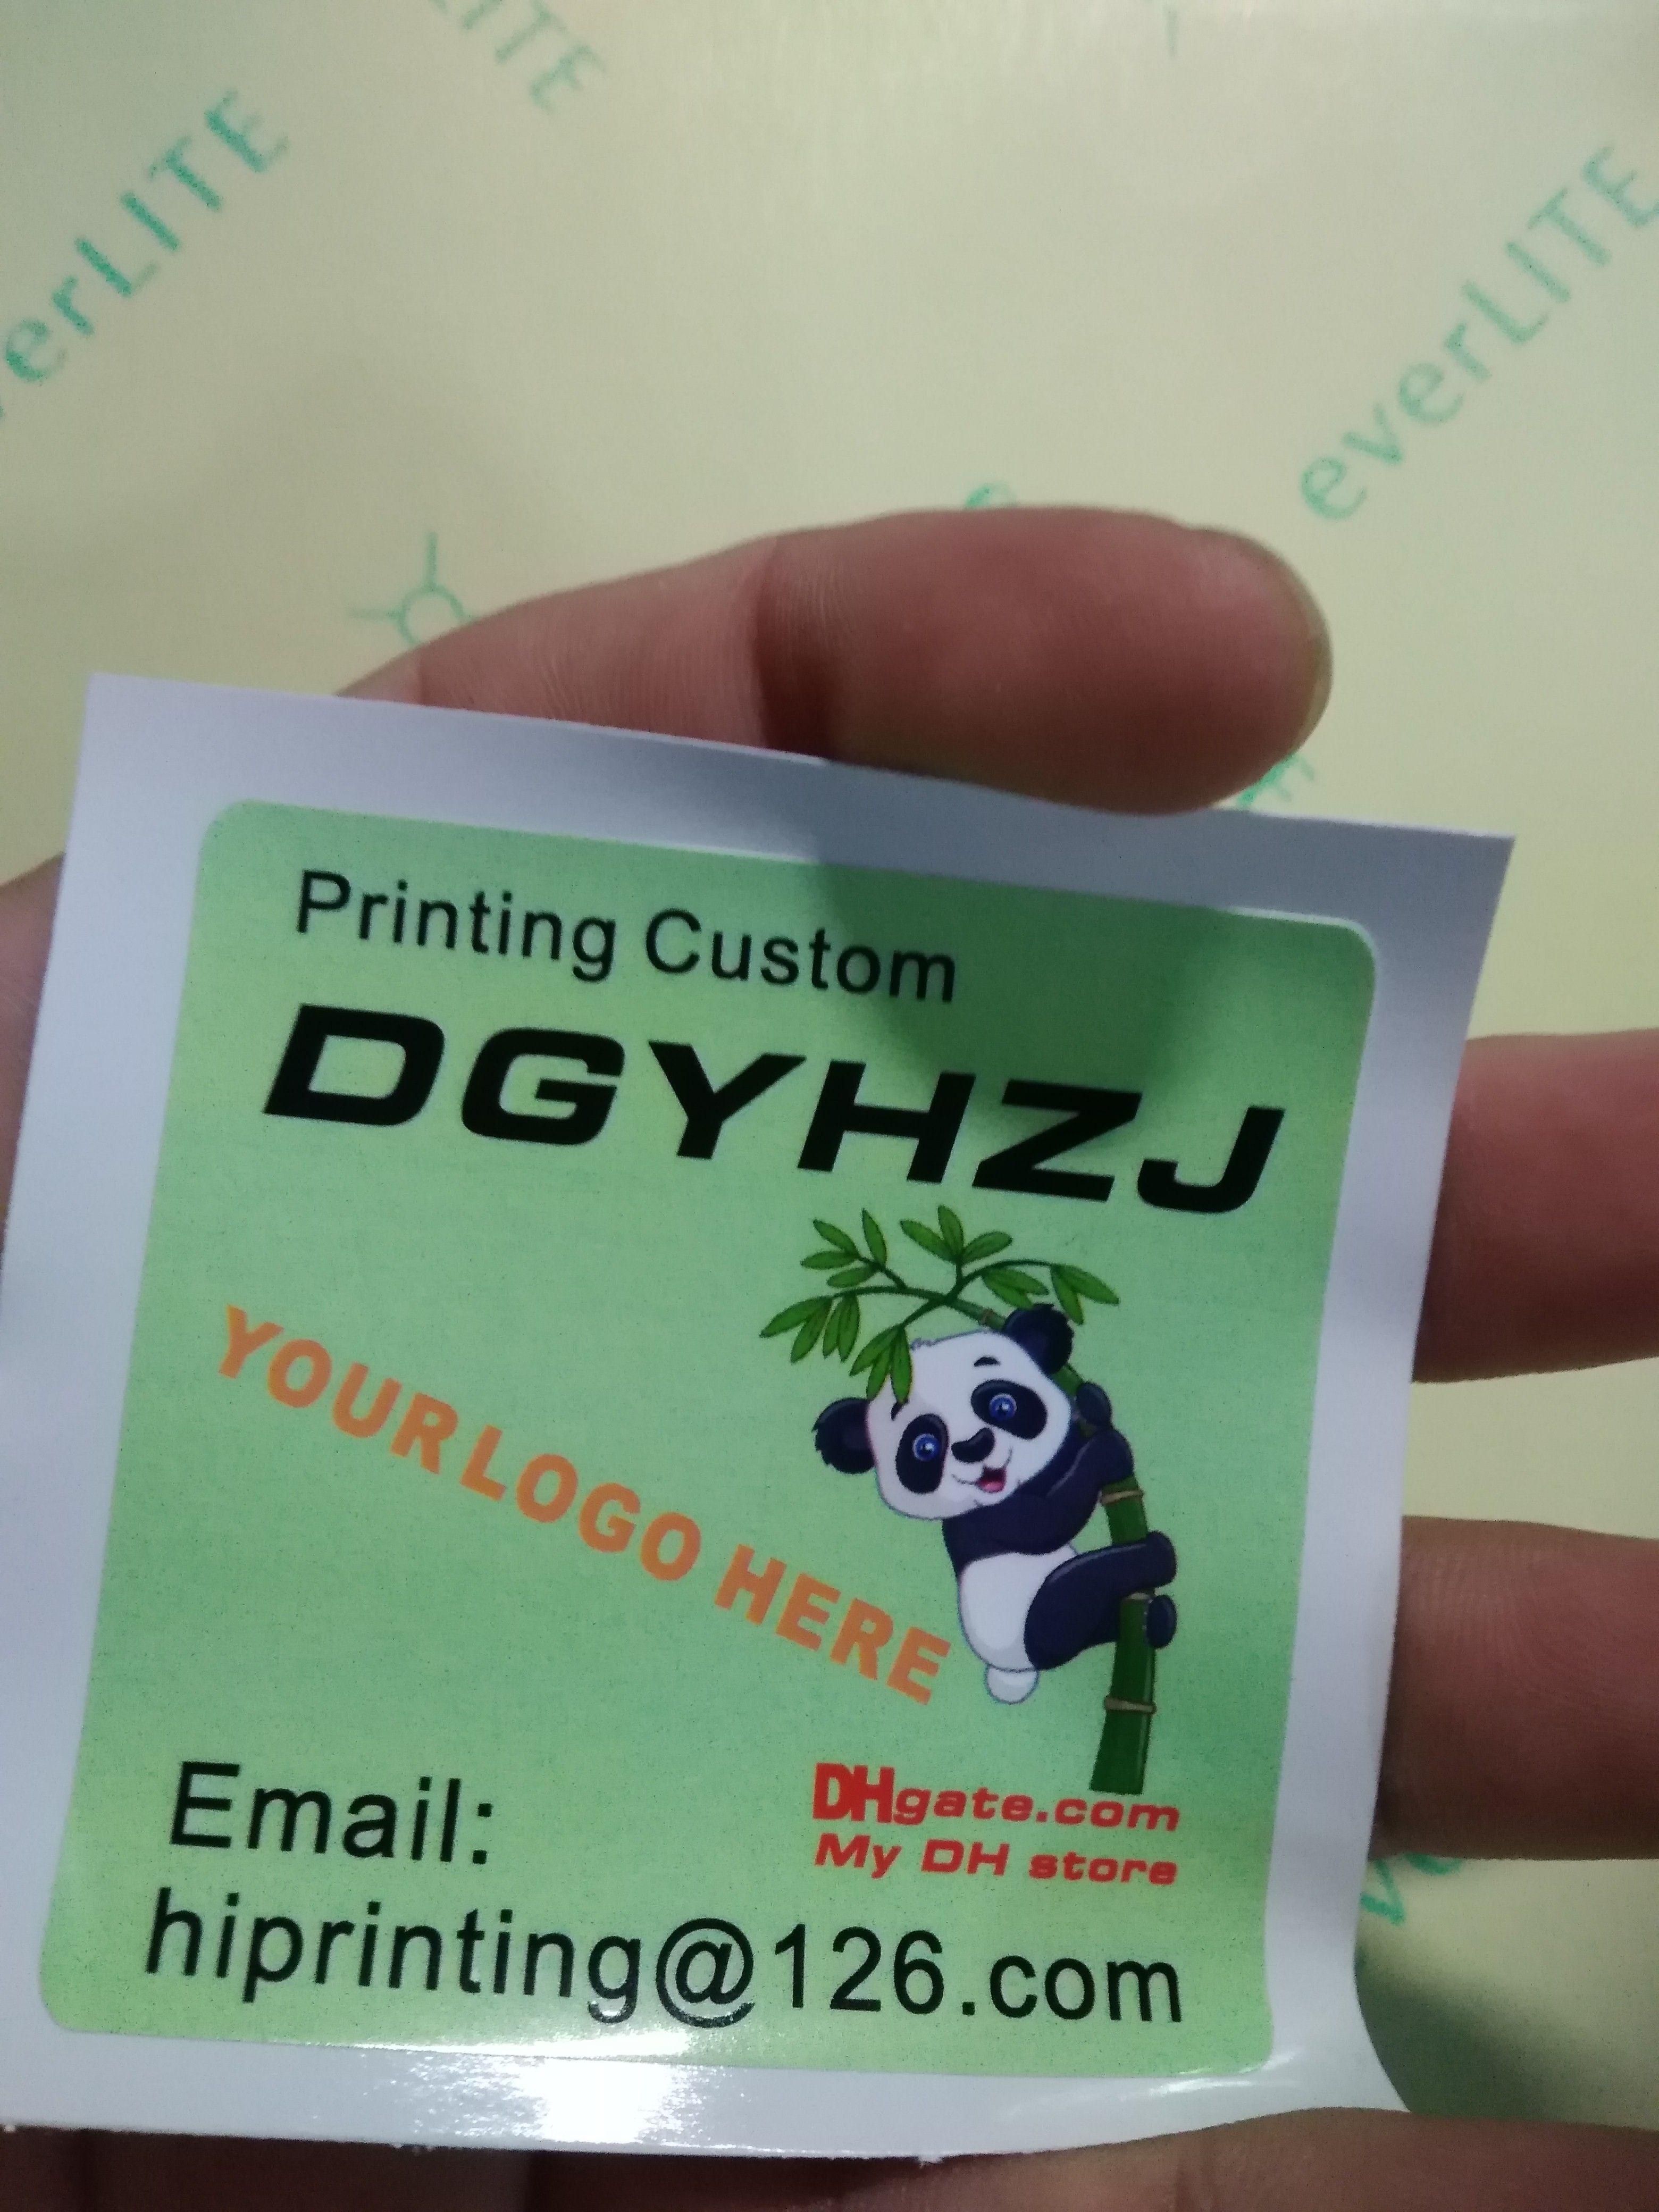 Matt Sticker Label Custom Color Paper Stationery Stores From